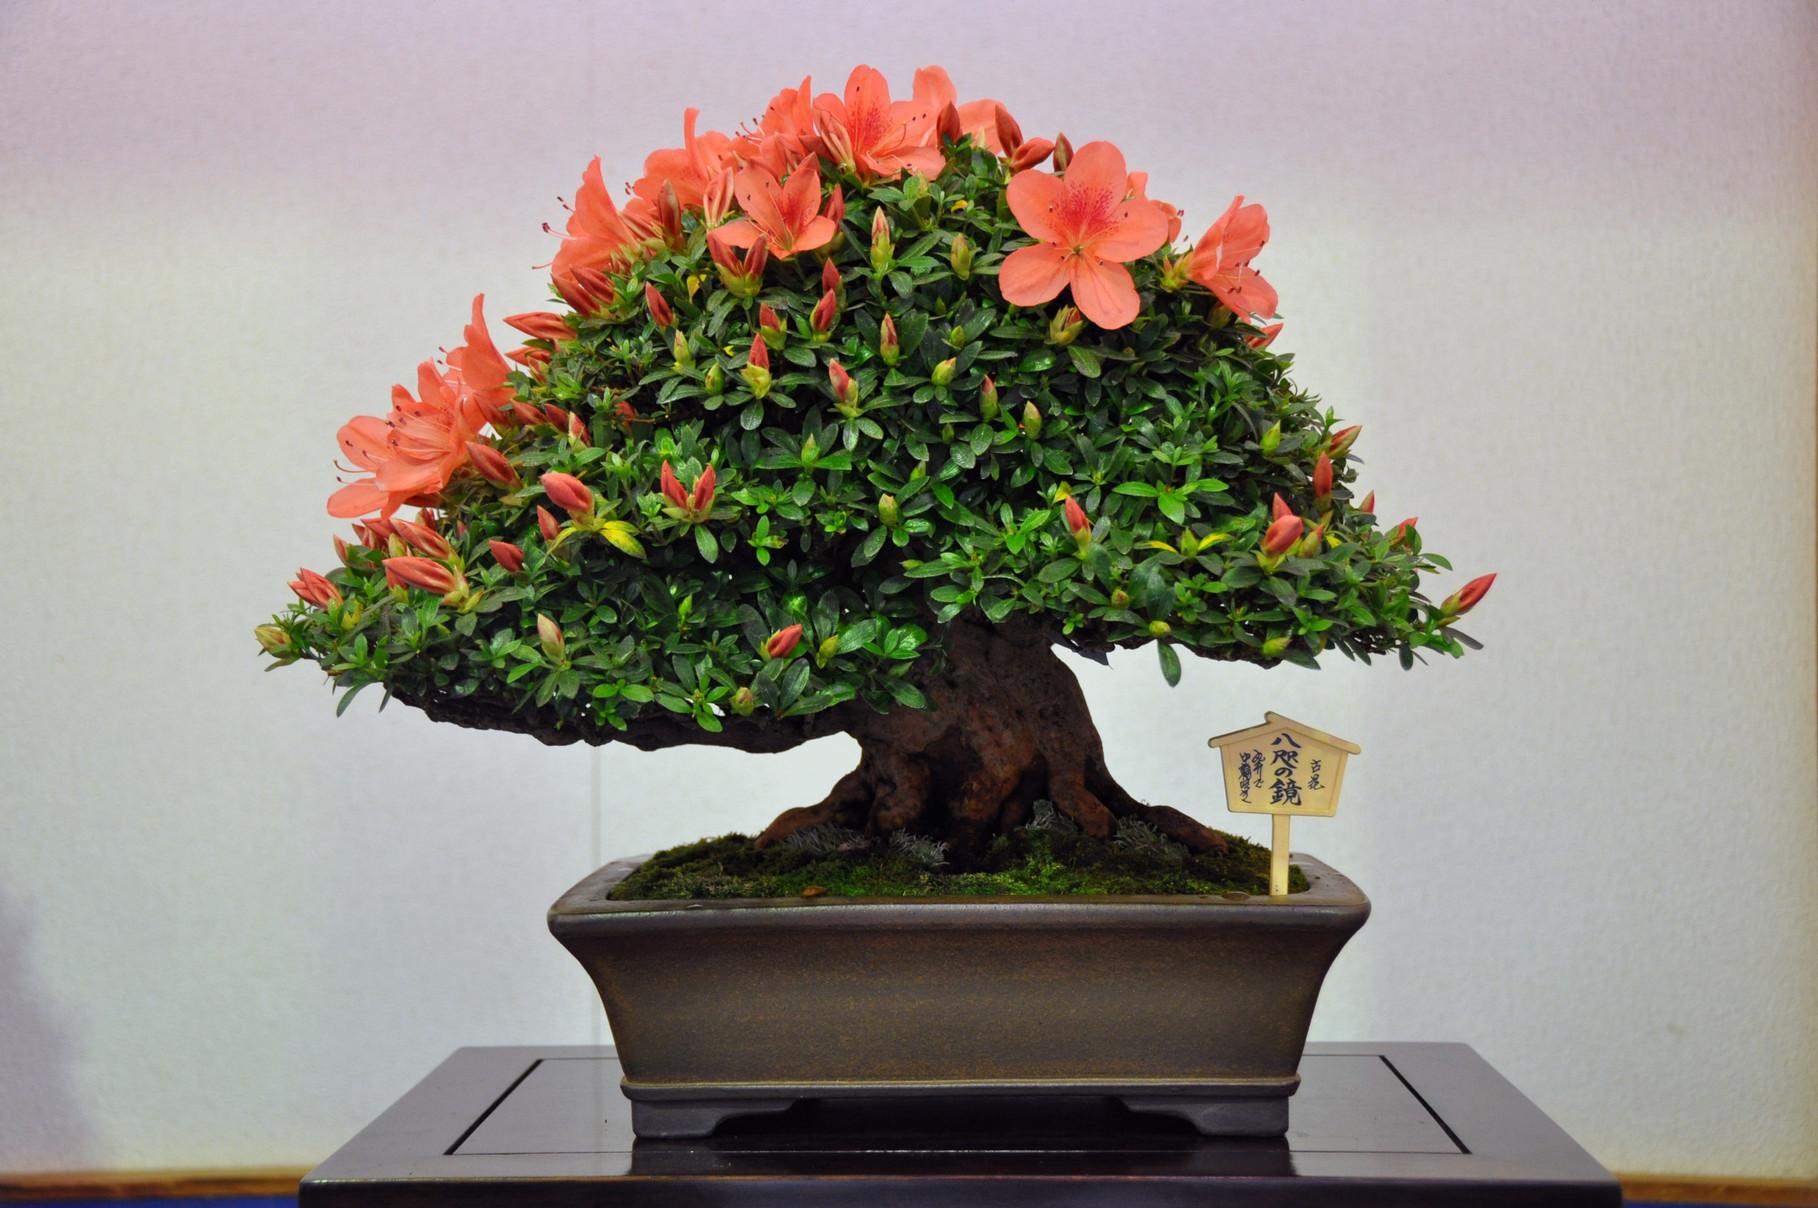 Prime Minister Award, Cultivars Osakazuki